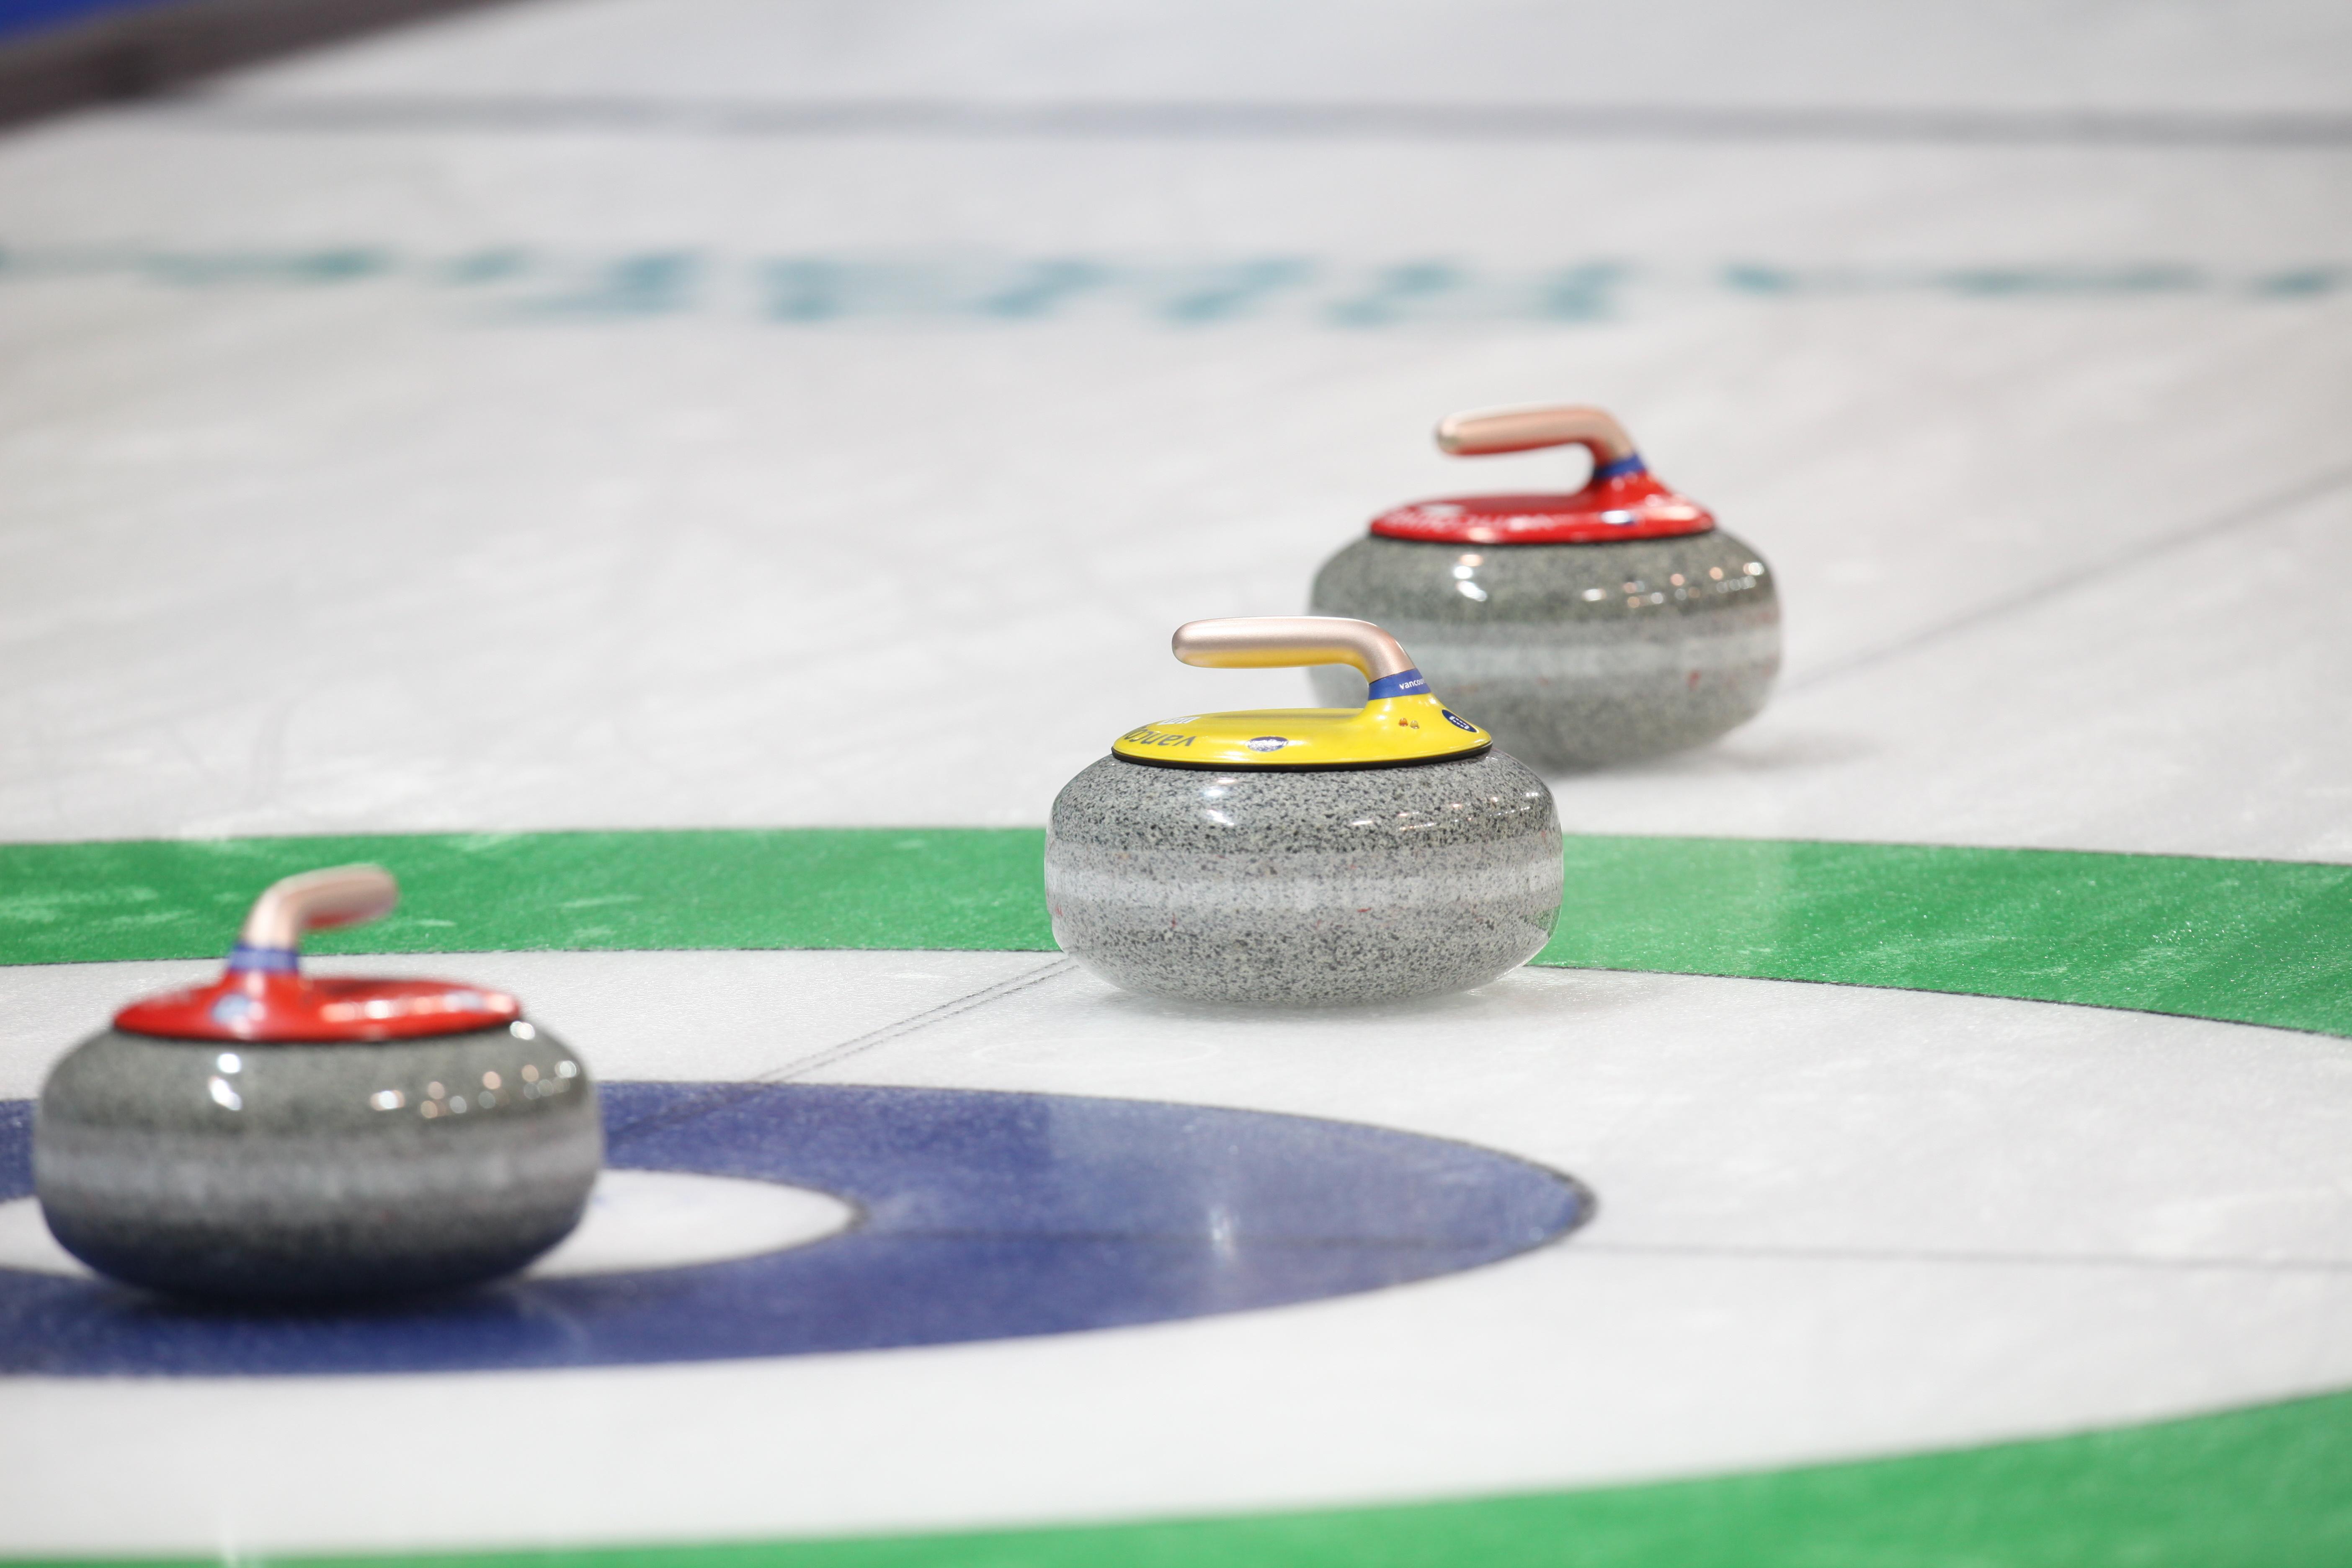 Three curling stones